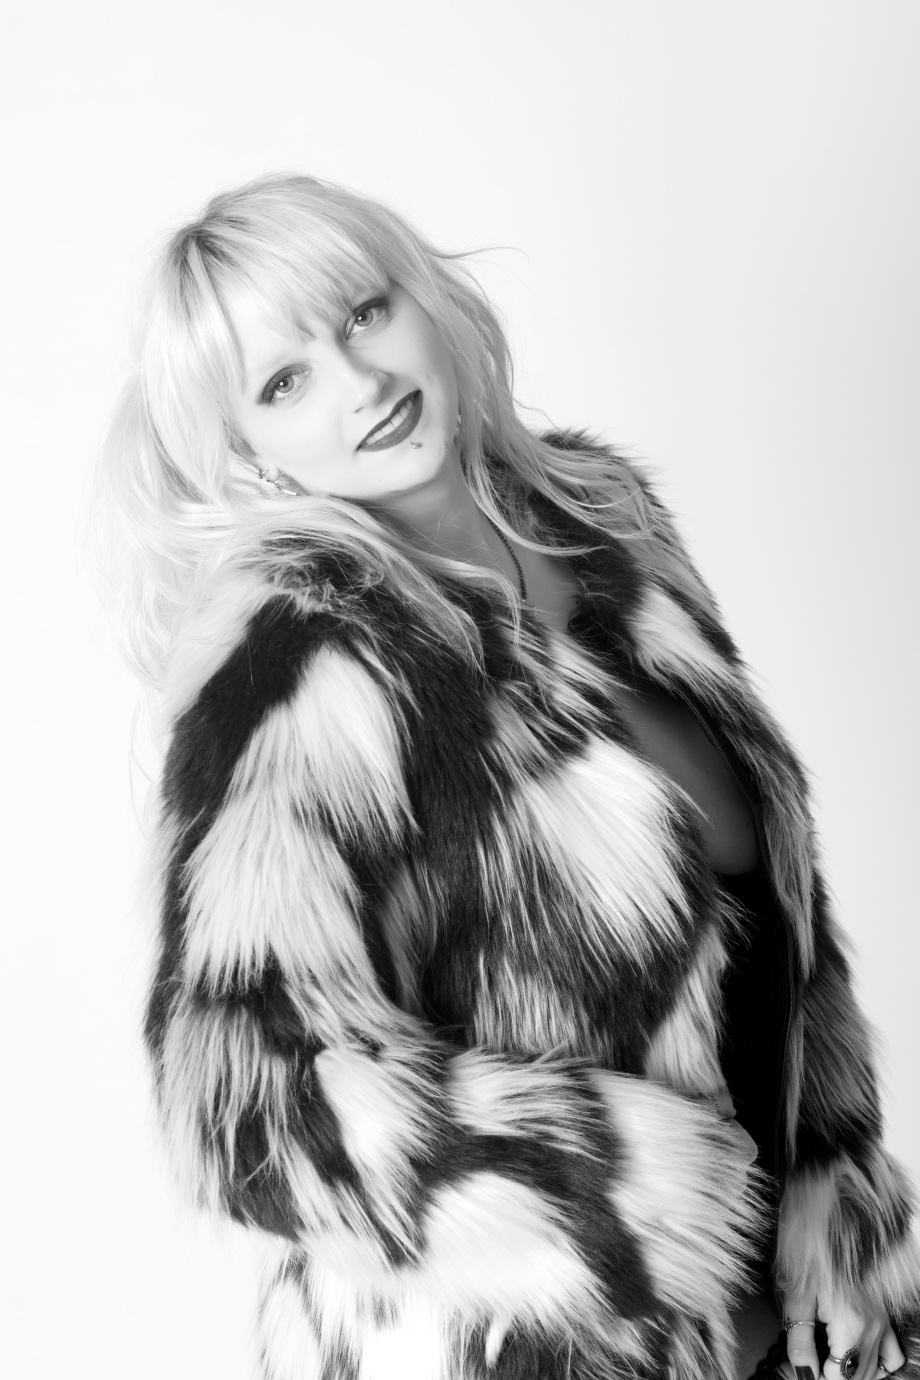 portrait, black and white, studio, glamour, ireland, cork, blonde, lingerie, boudoir